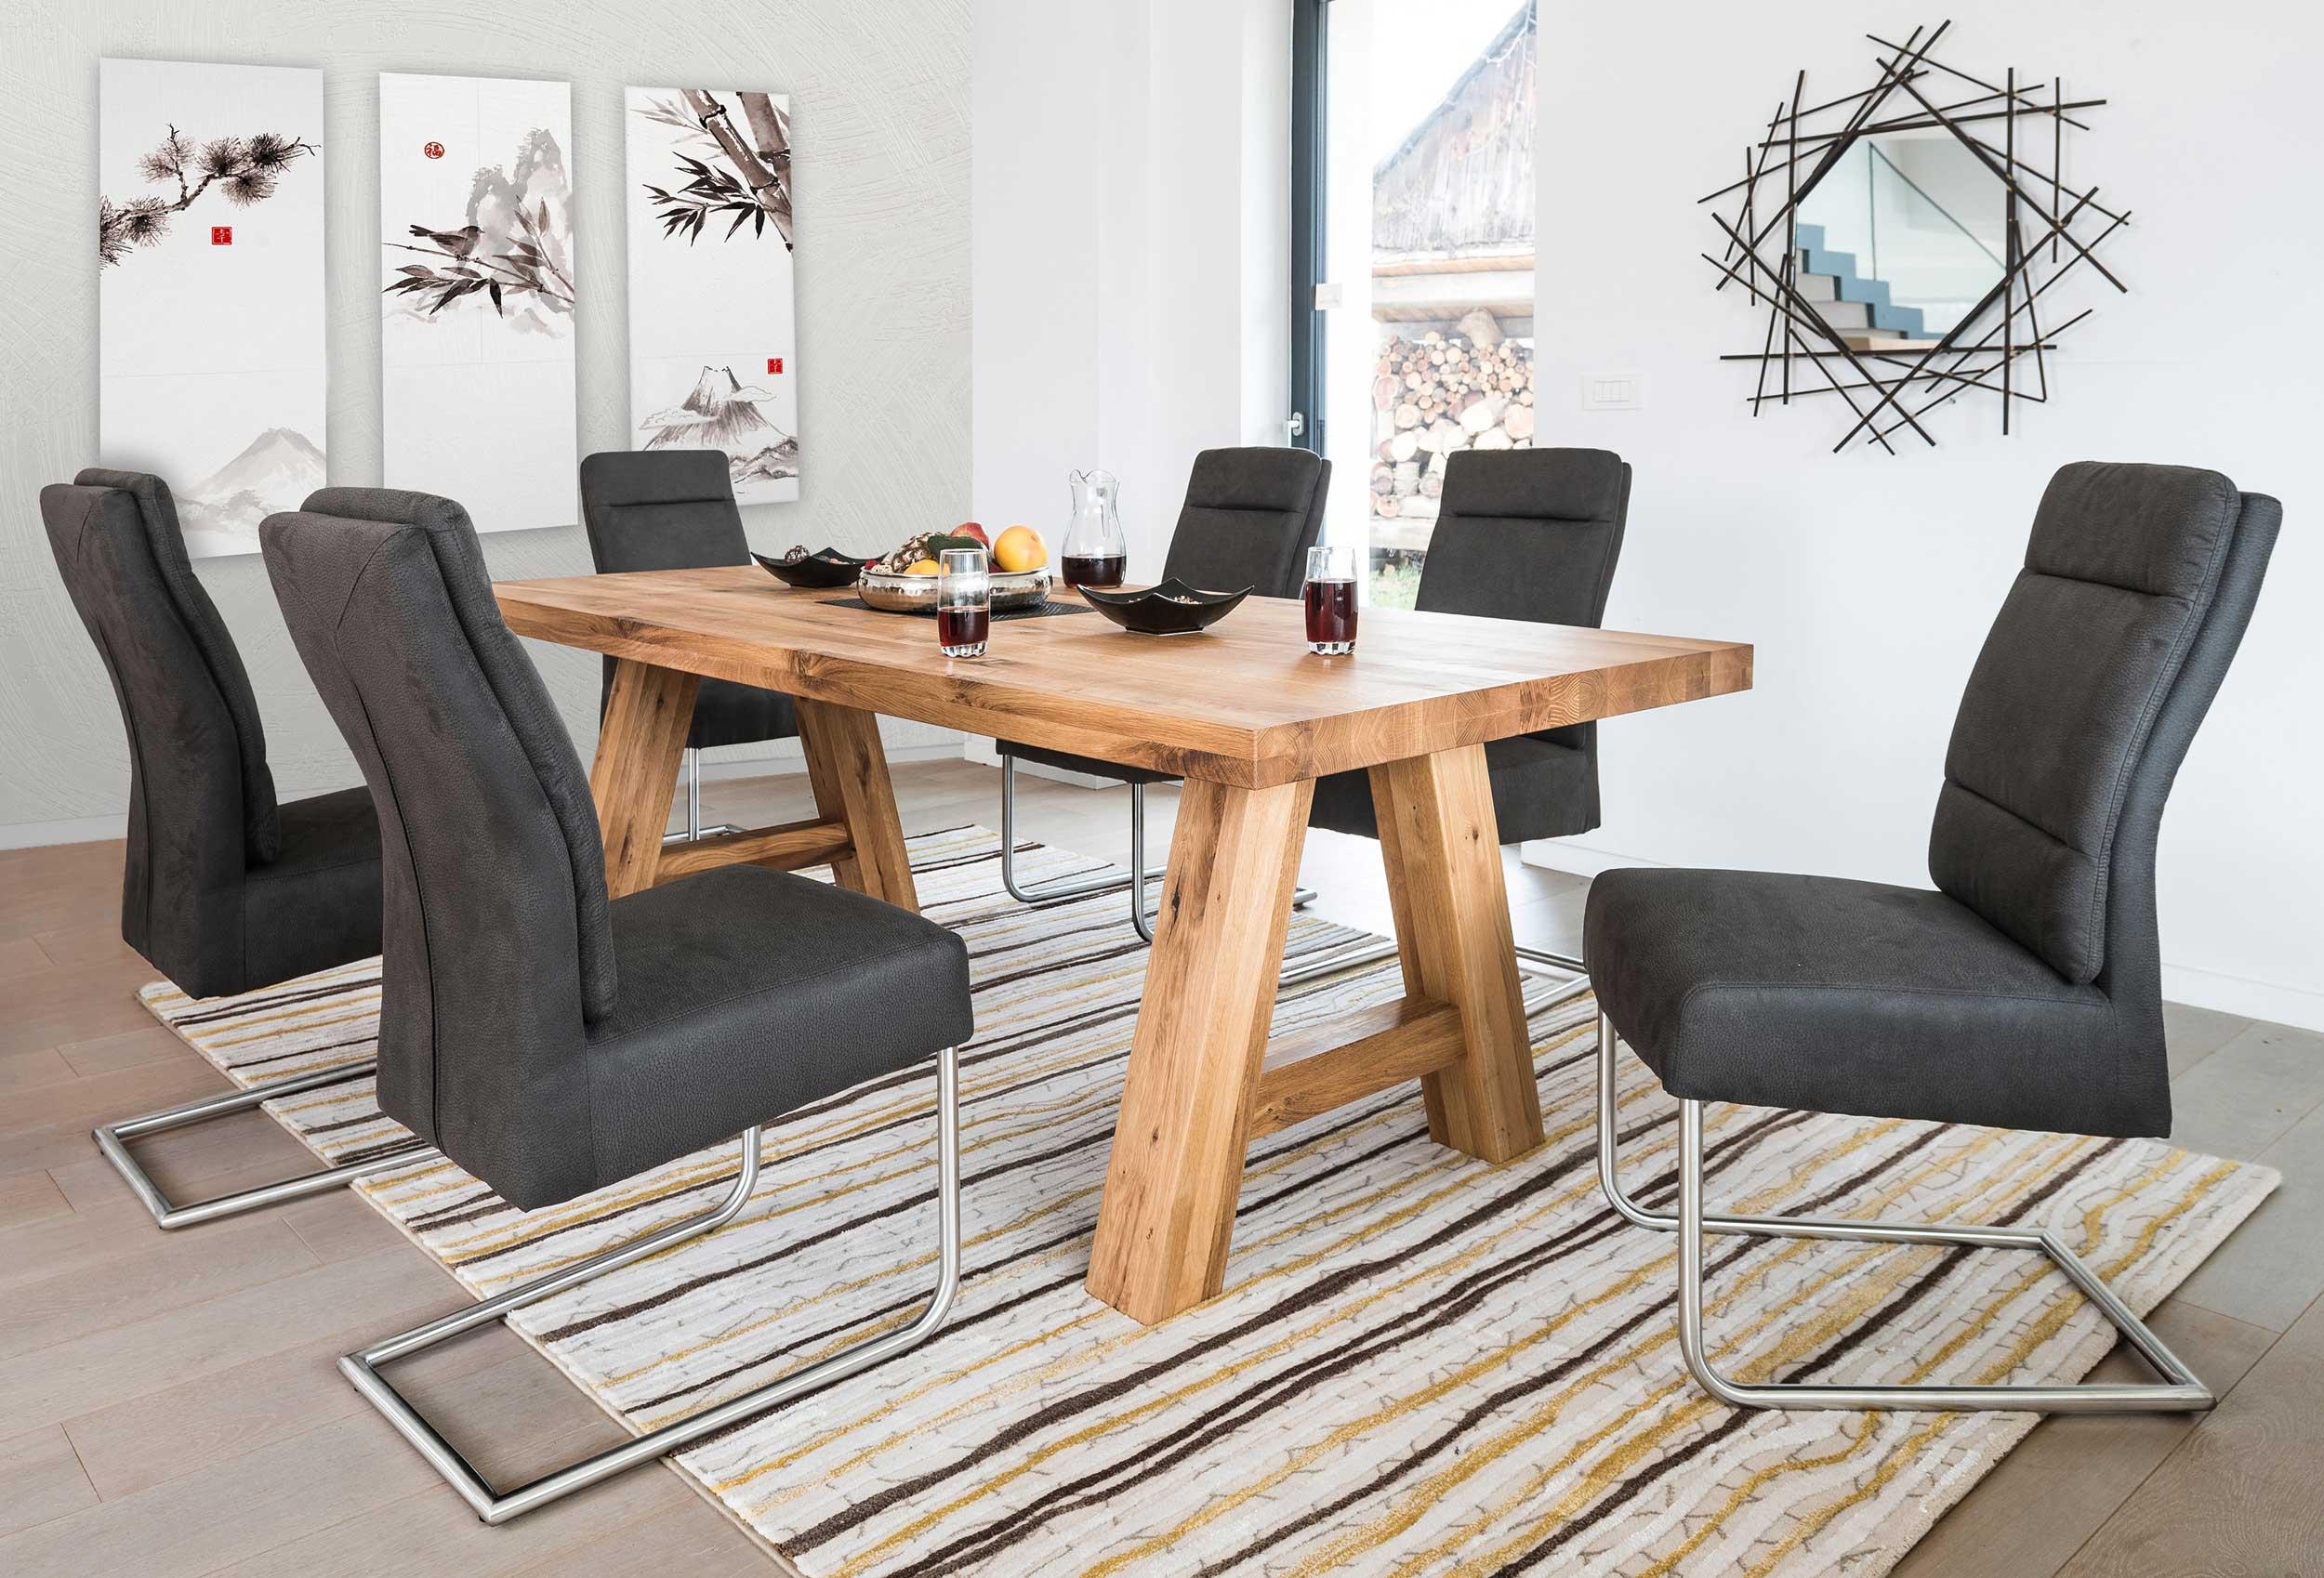 Standard Furniture Lynn Holztischh massiv eiche geölt